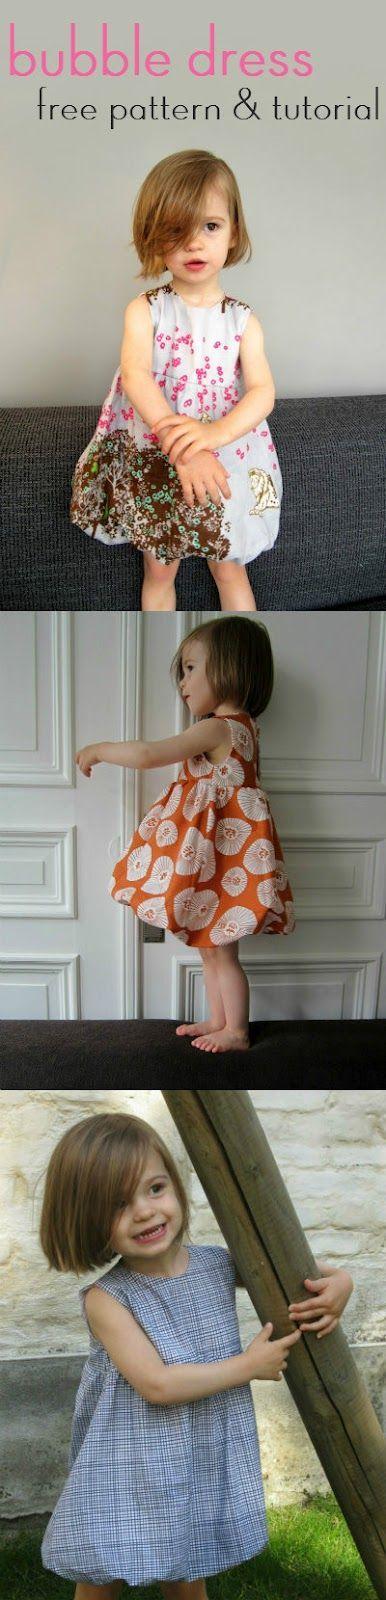 Bubble dress: patterns and tutorial süßes Kinderkleid mit Nähanleitung #Mädchenkleid #DIY #Kinderkleidung #Selbstgemachtes